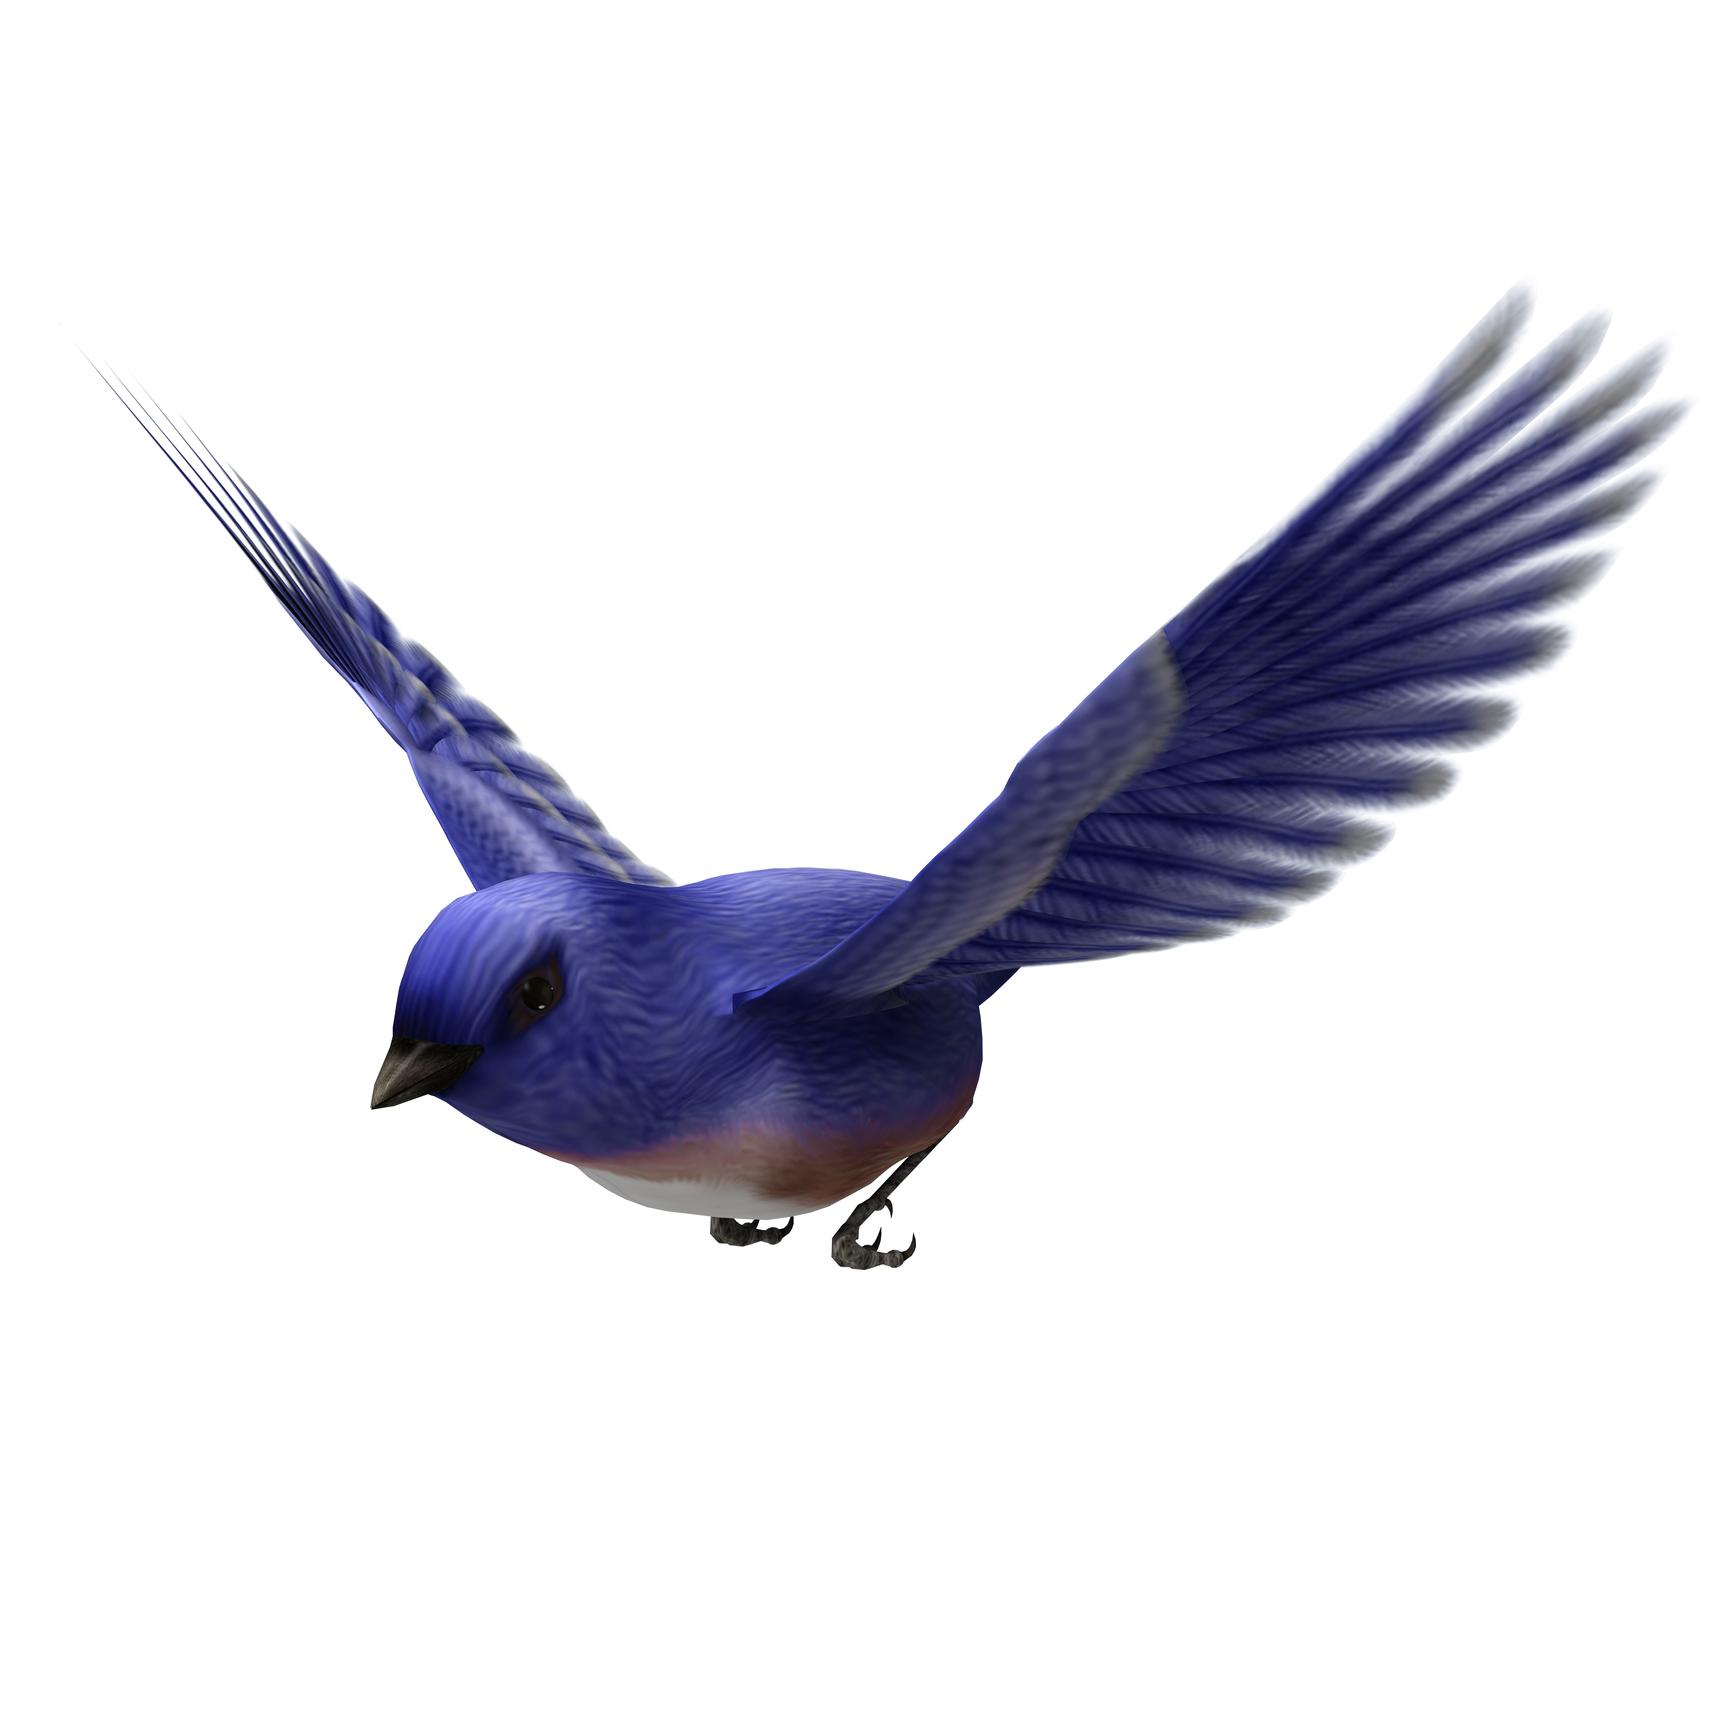 A bluebird in flight